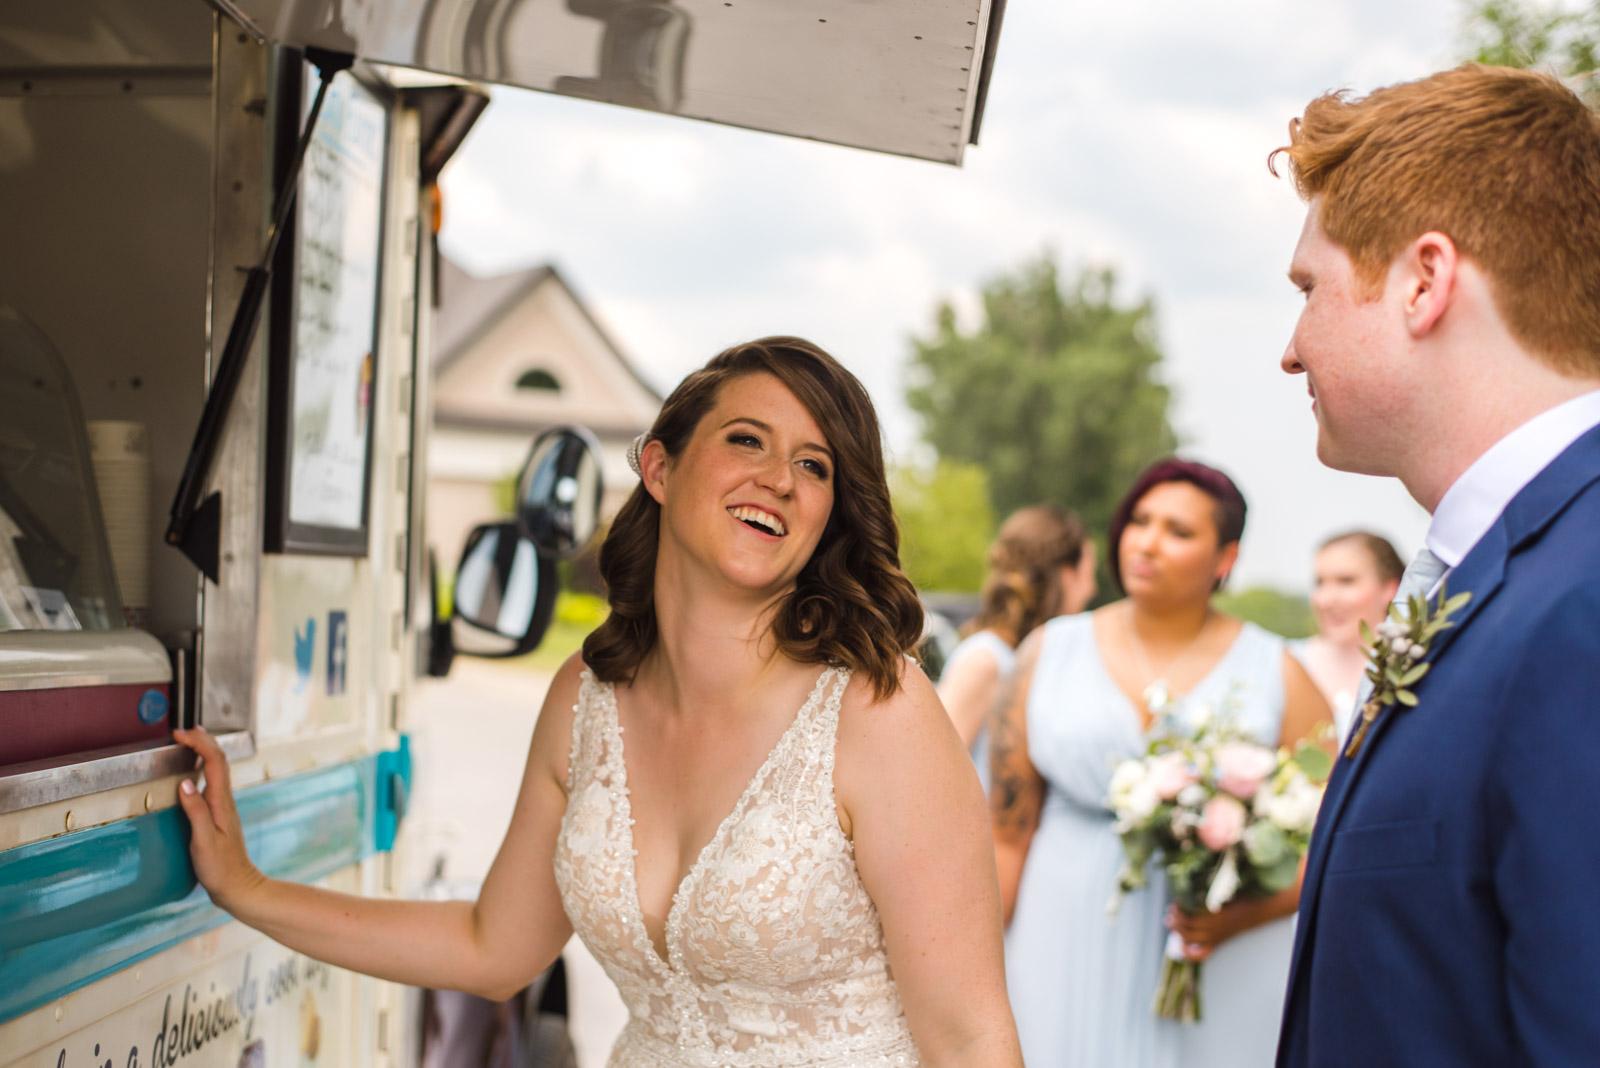 Emerson & Elicia's Golf Course Wedding Aidan & Leanne Hennebry Hamilton Wedding Videographers Photographers Niagara Hush Hush Photography & Film-28.jpg